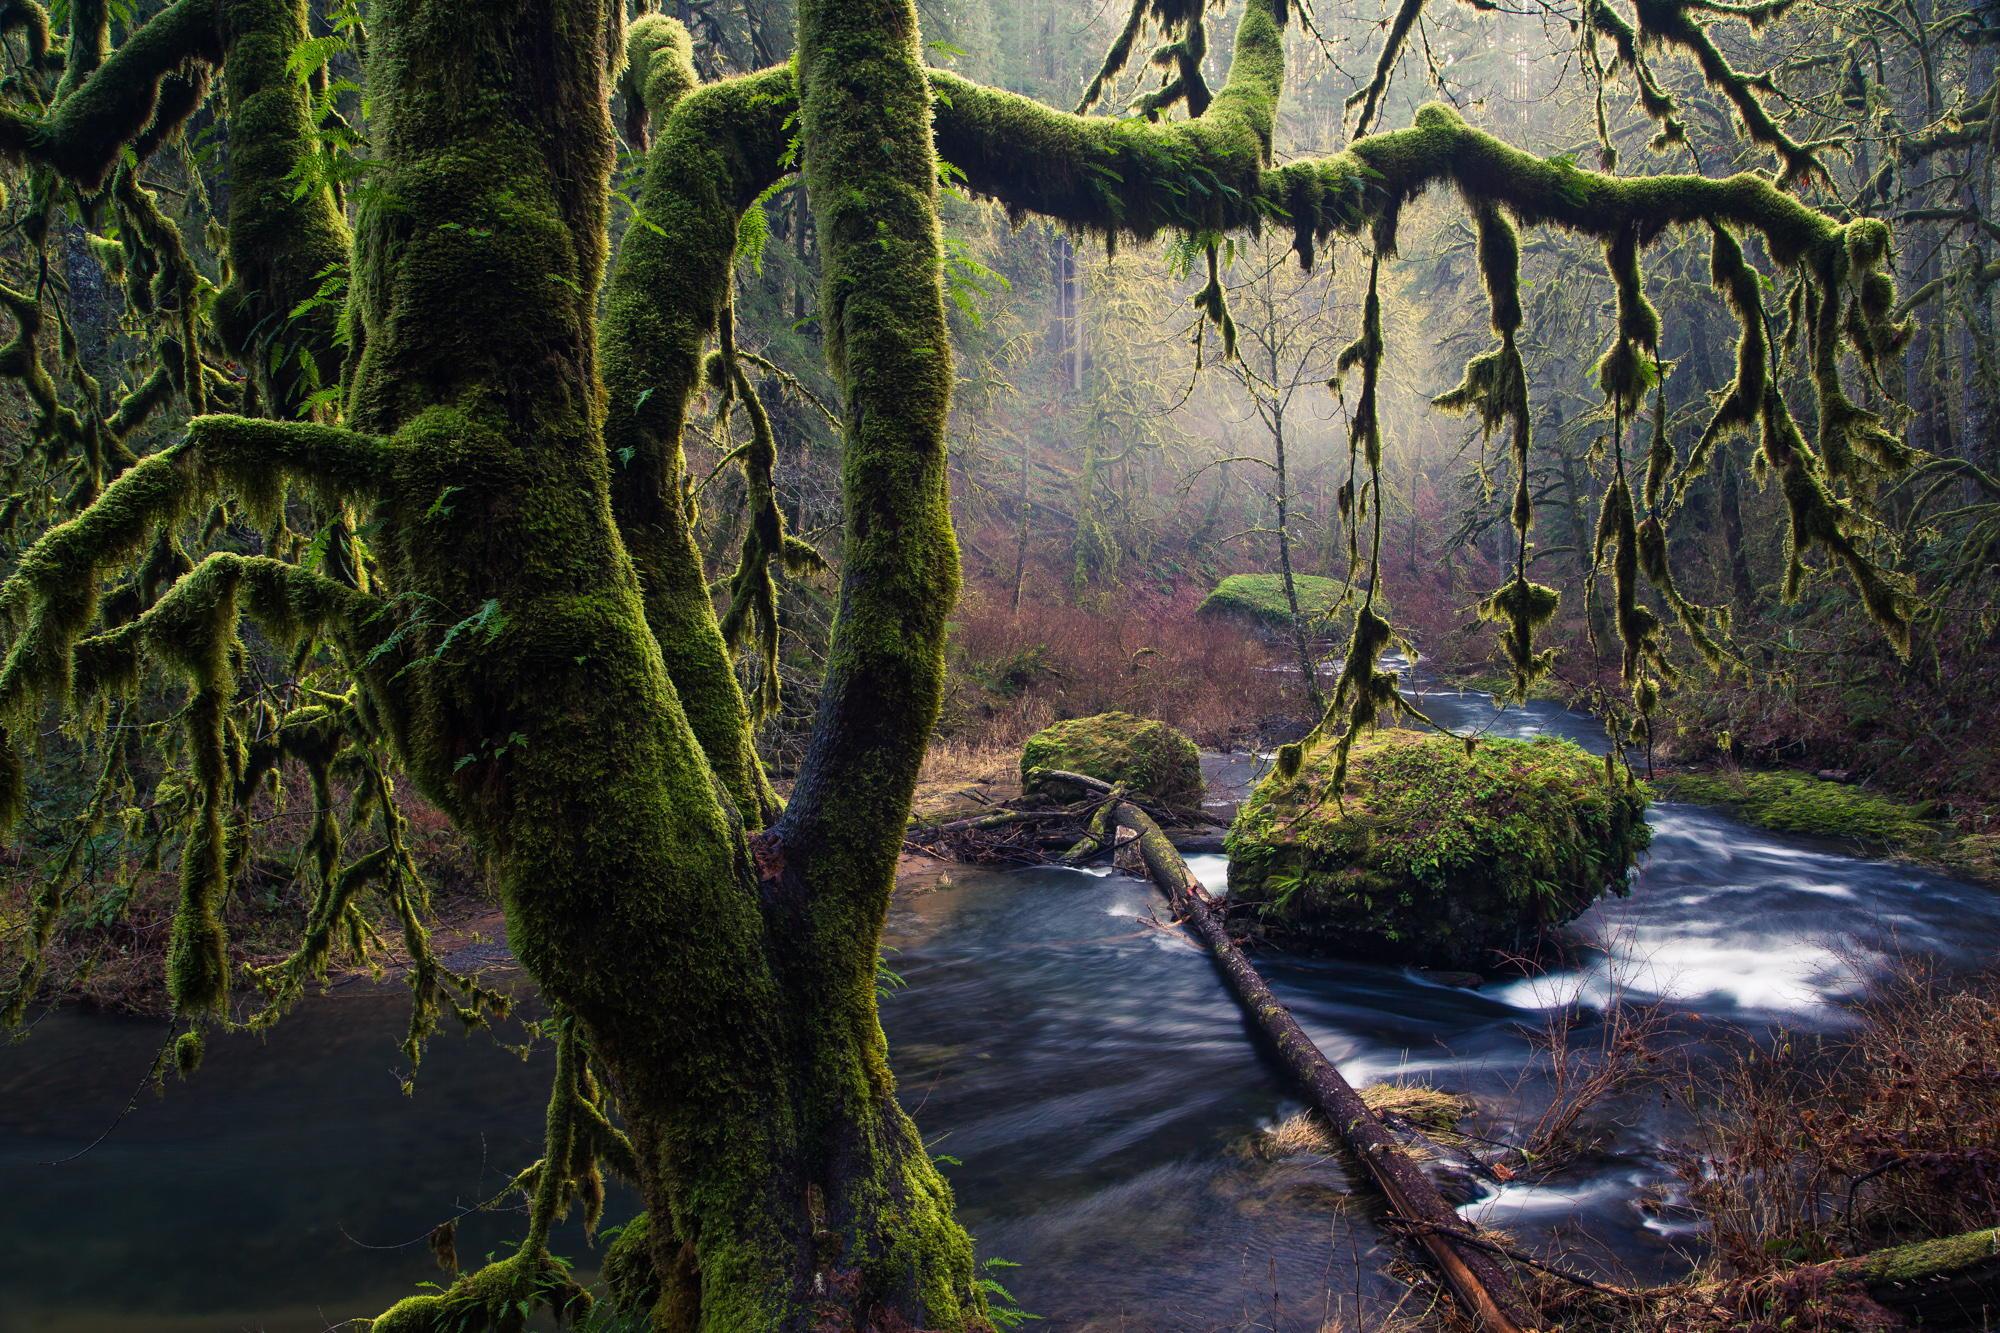 природа вода река трава деревья мох  № 3800947 без смс